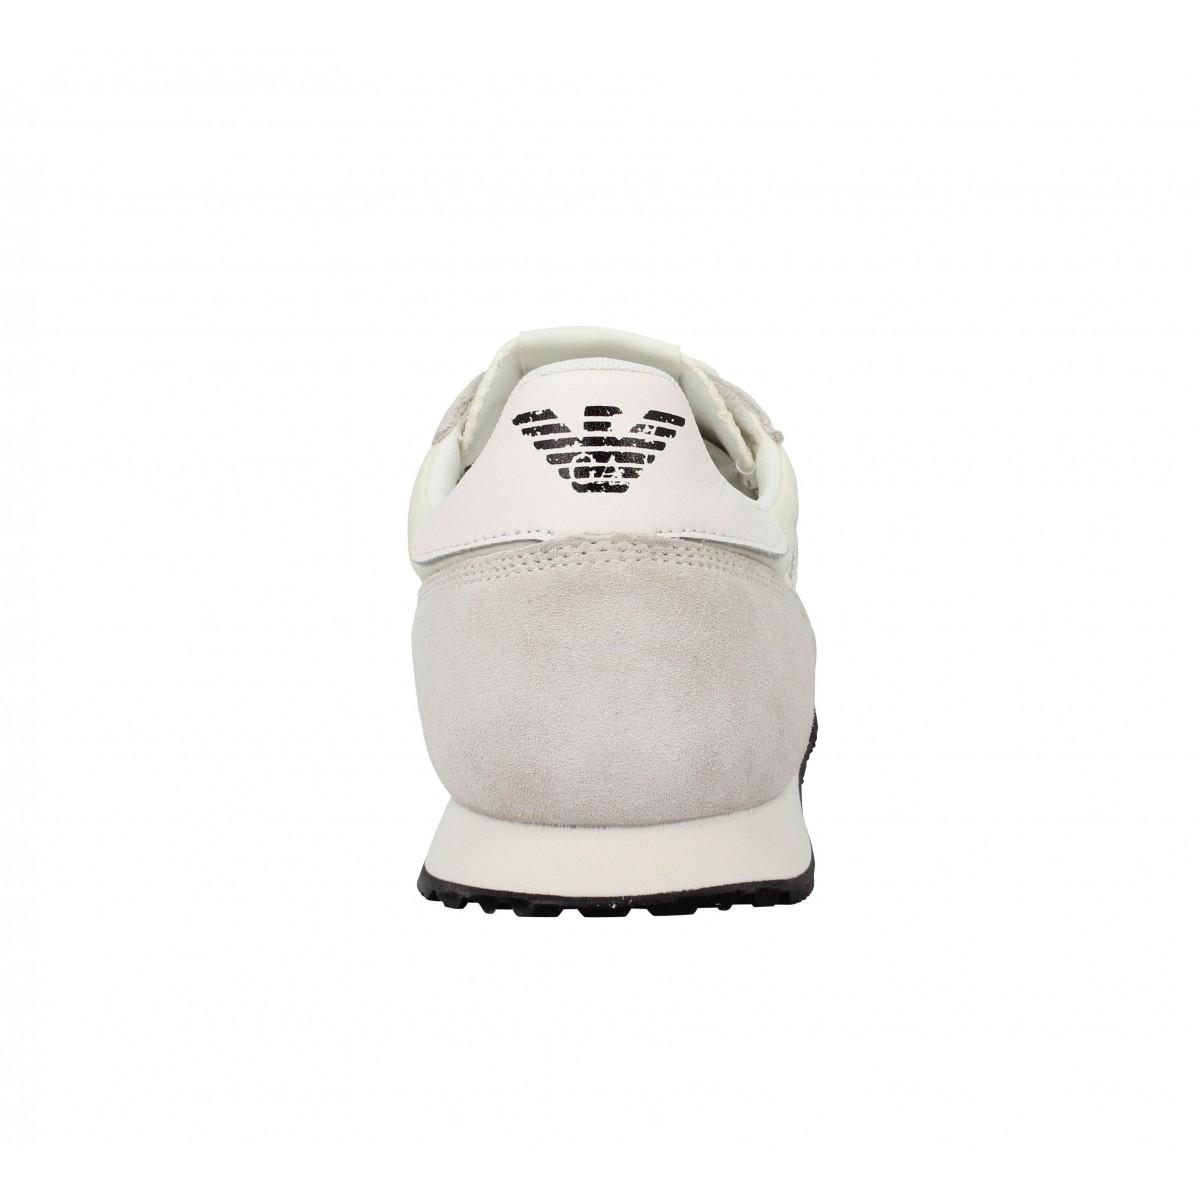 6524 Chaussures Armani Toile Velours Jeans Homme BlancFanny UzMVpS